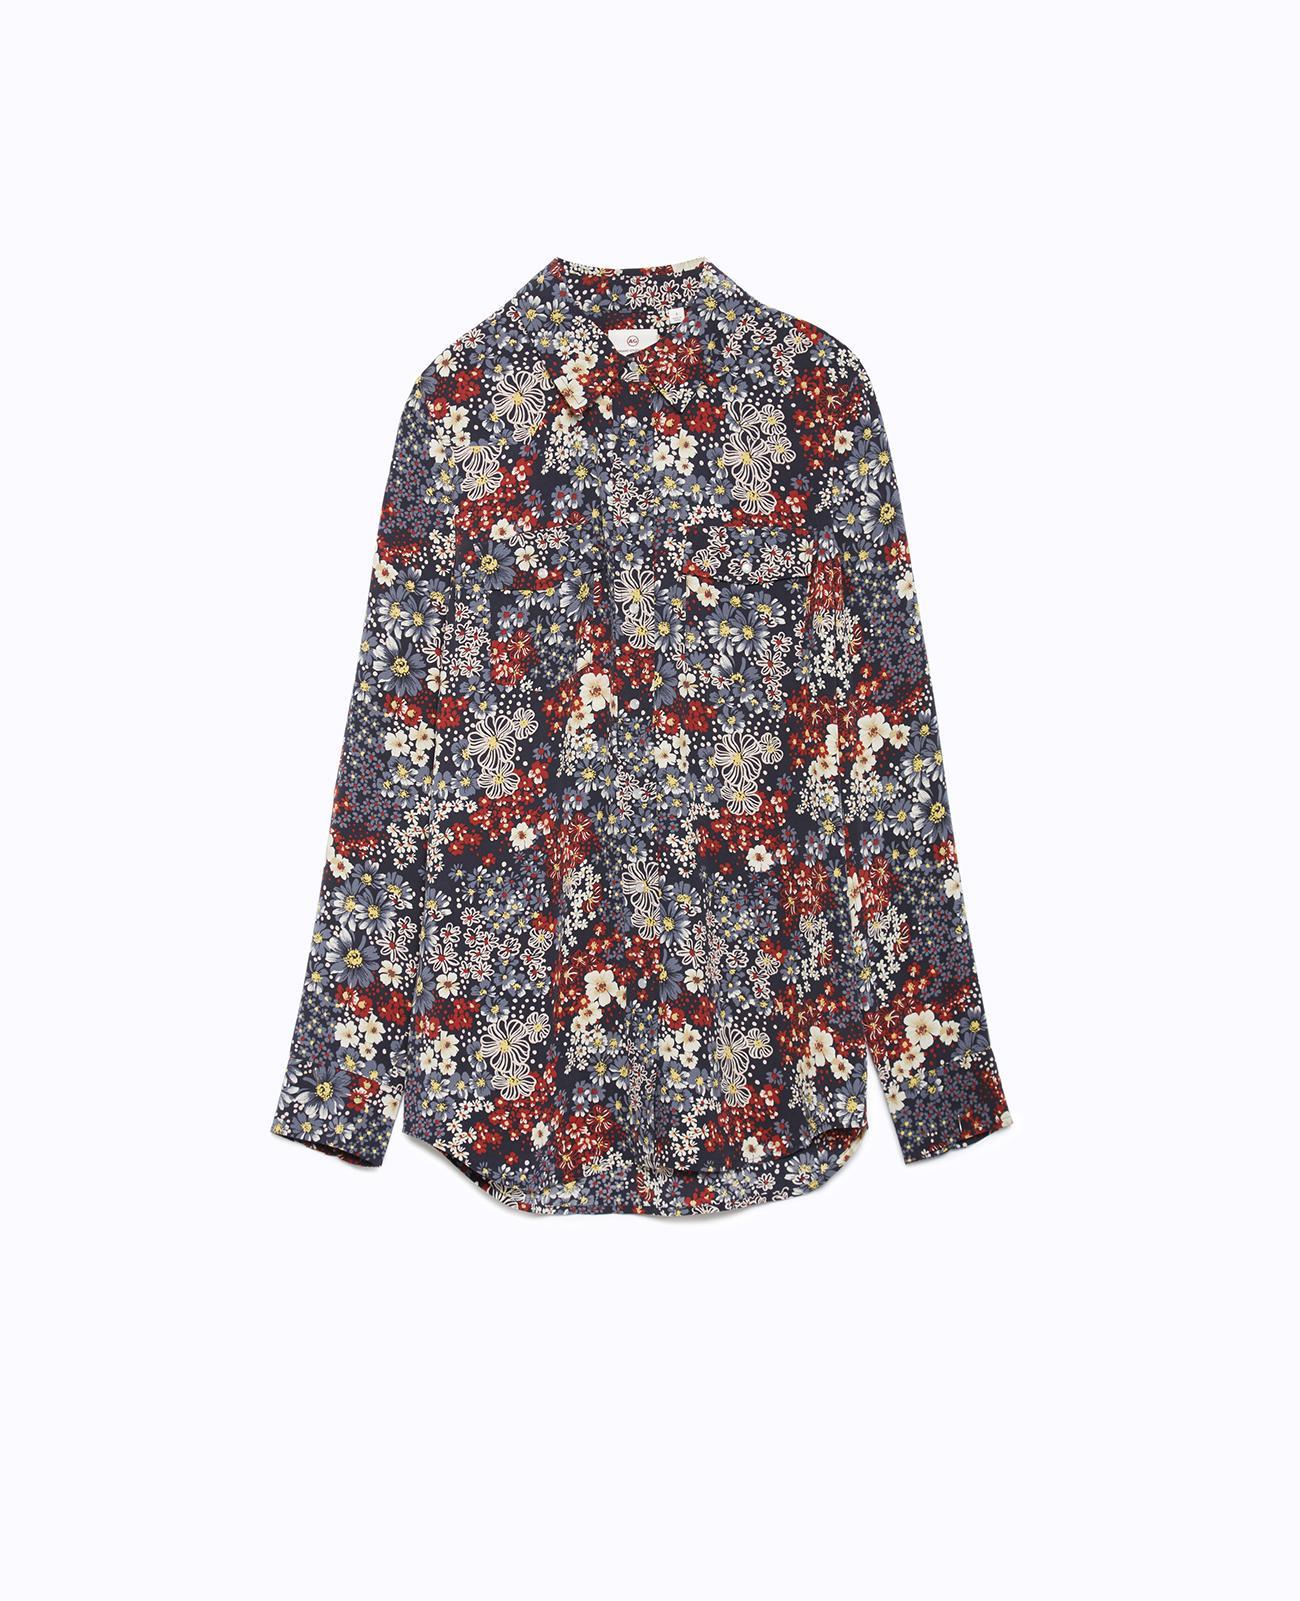 The Sutton Shirt